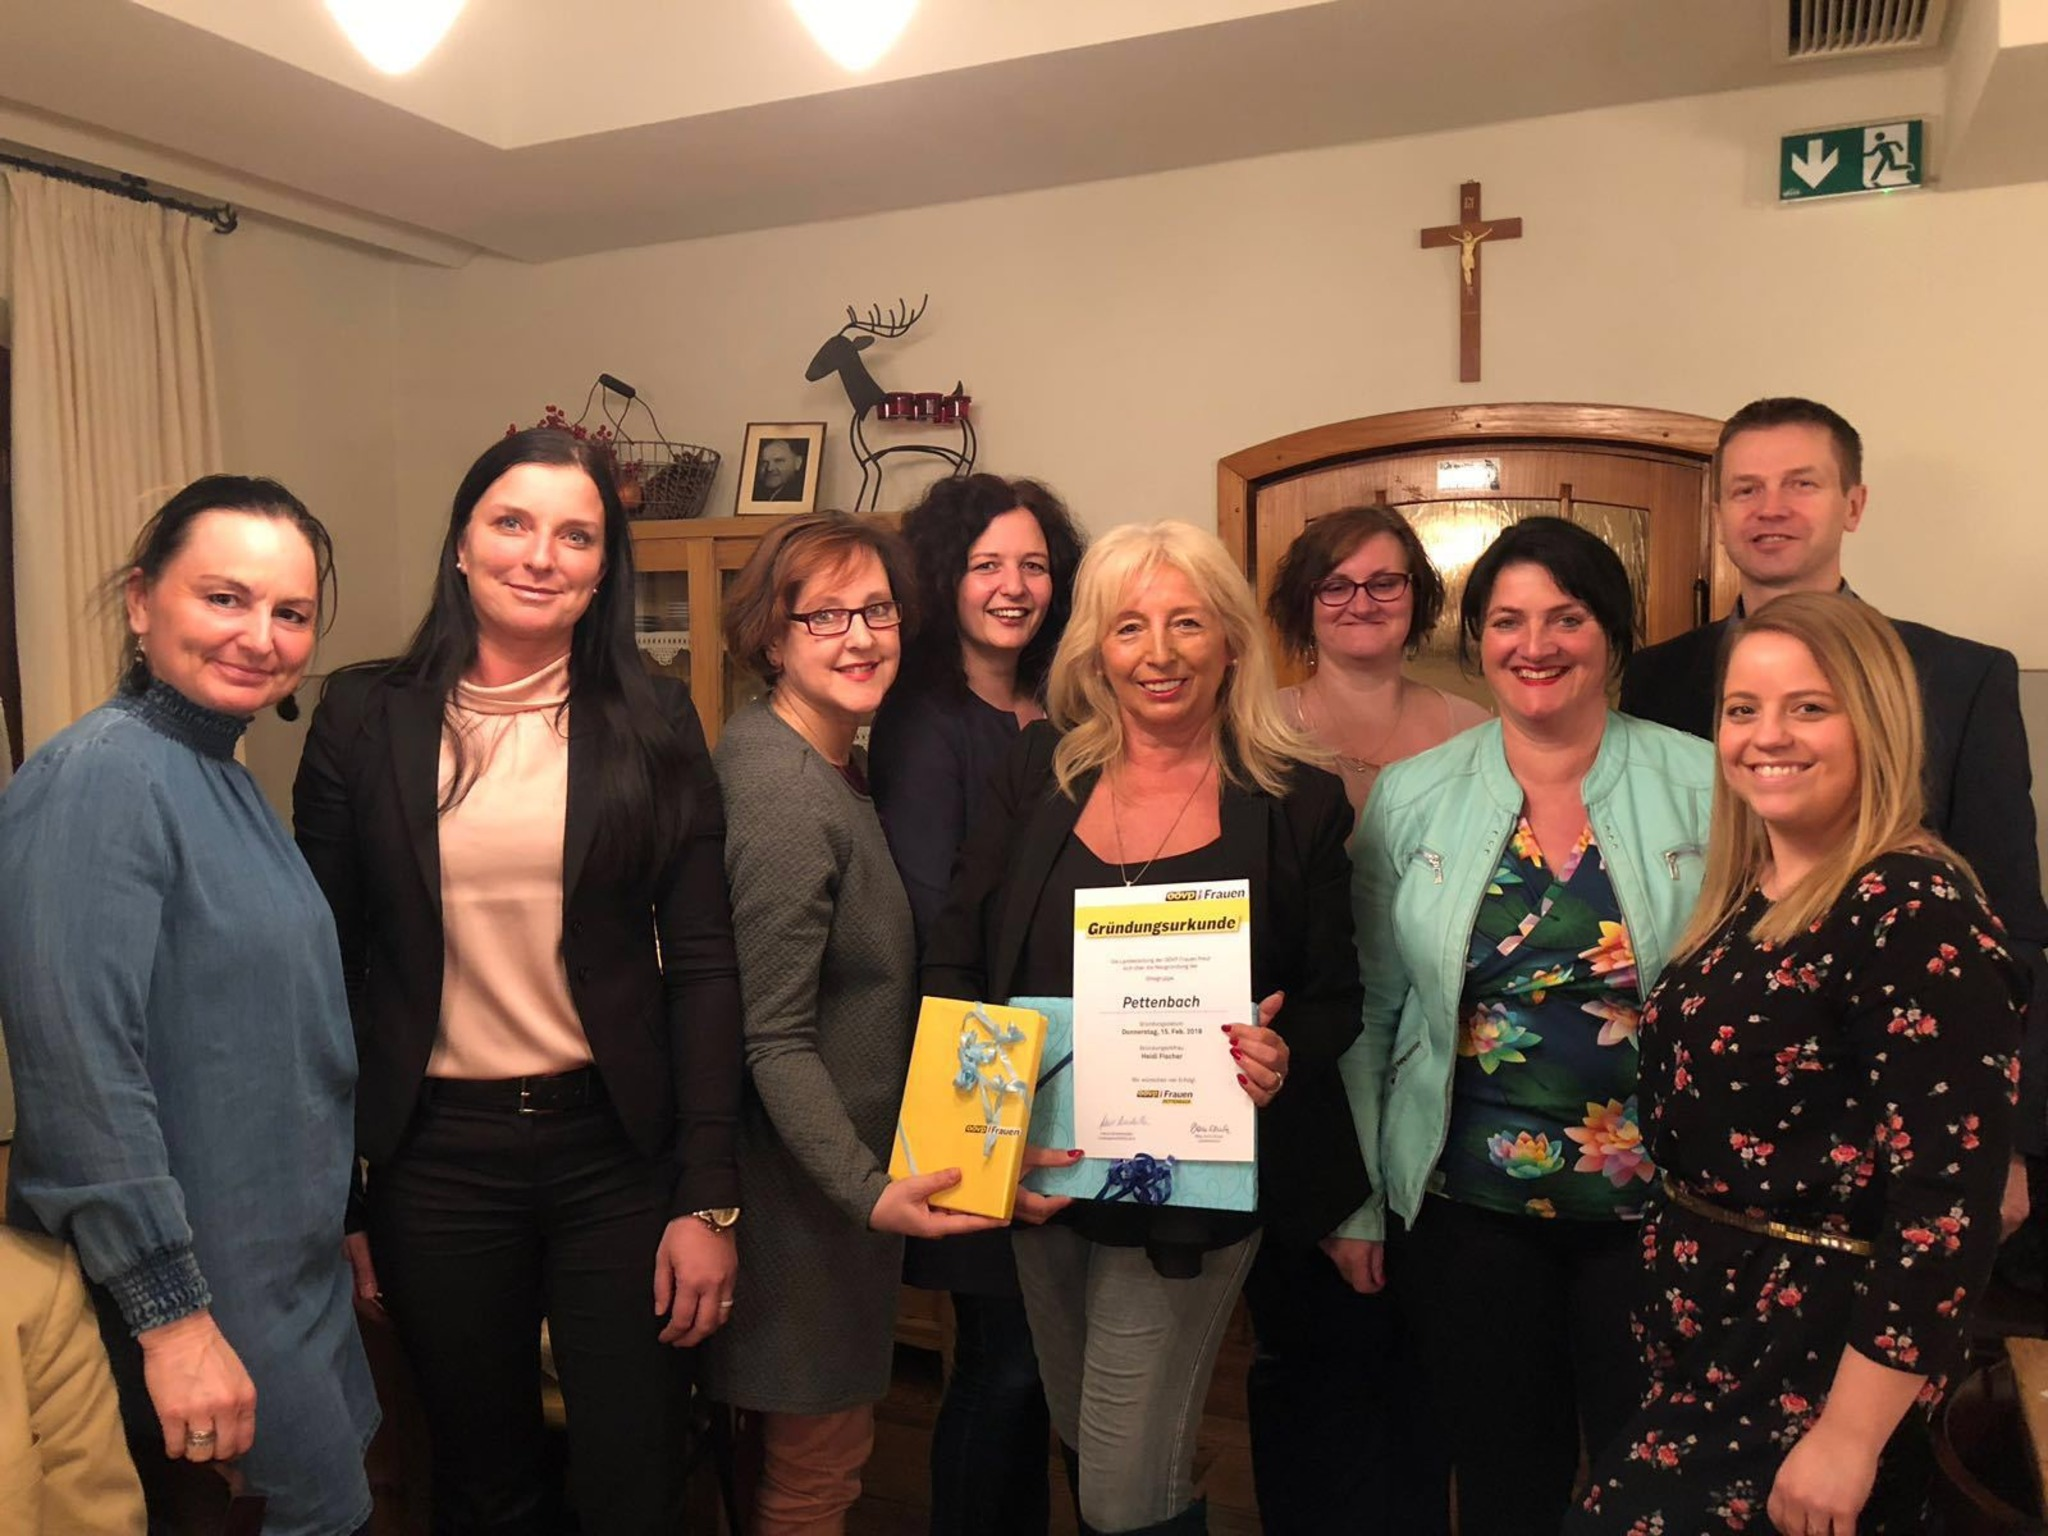 Pettenbach singles frauen: Kirchbichl single urlaub